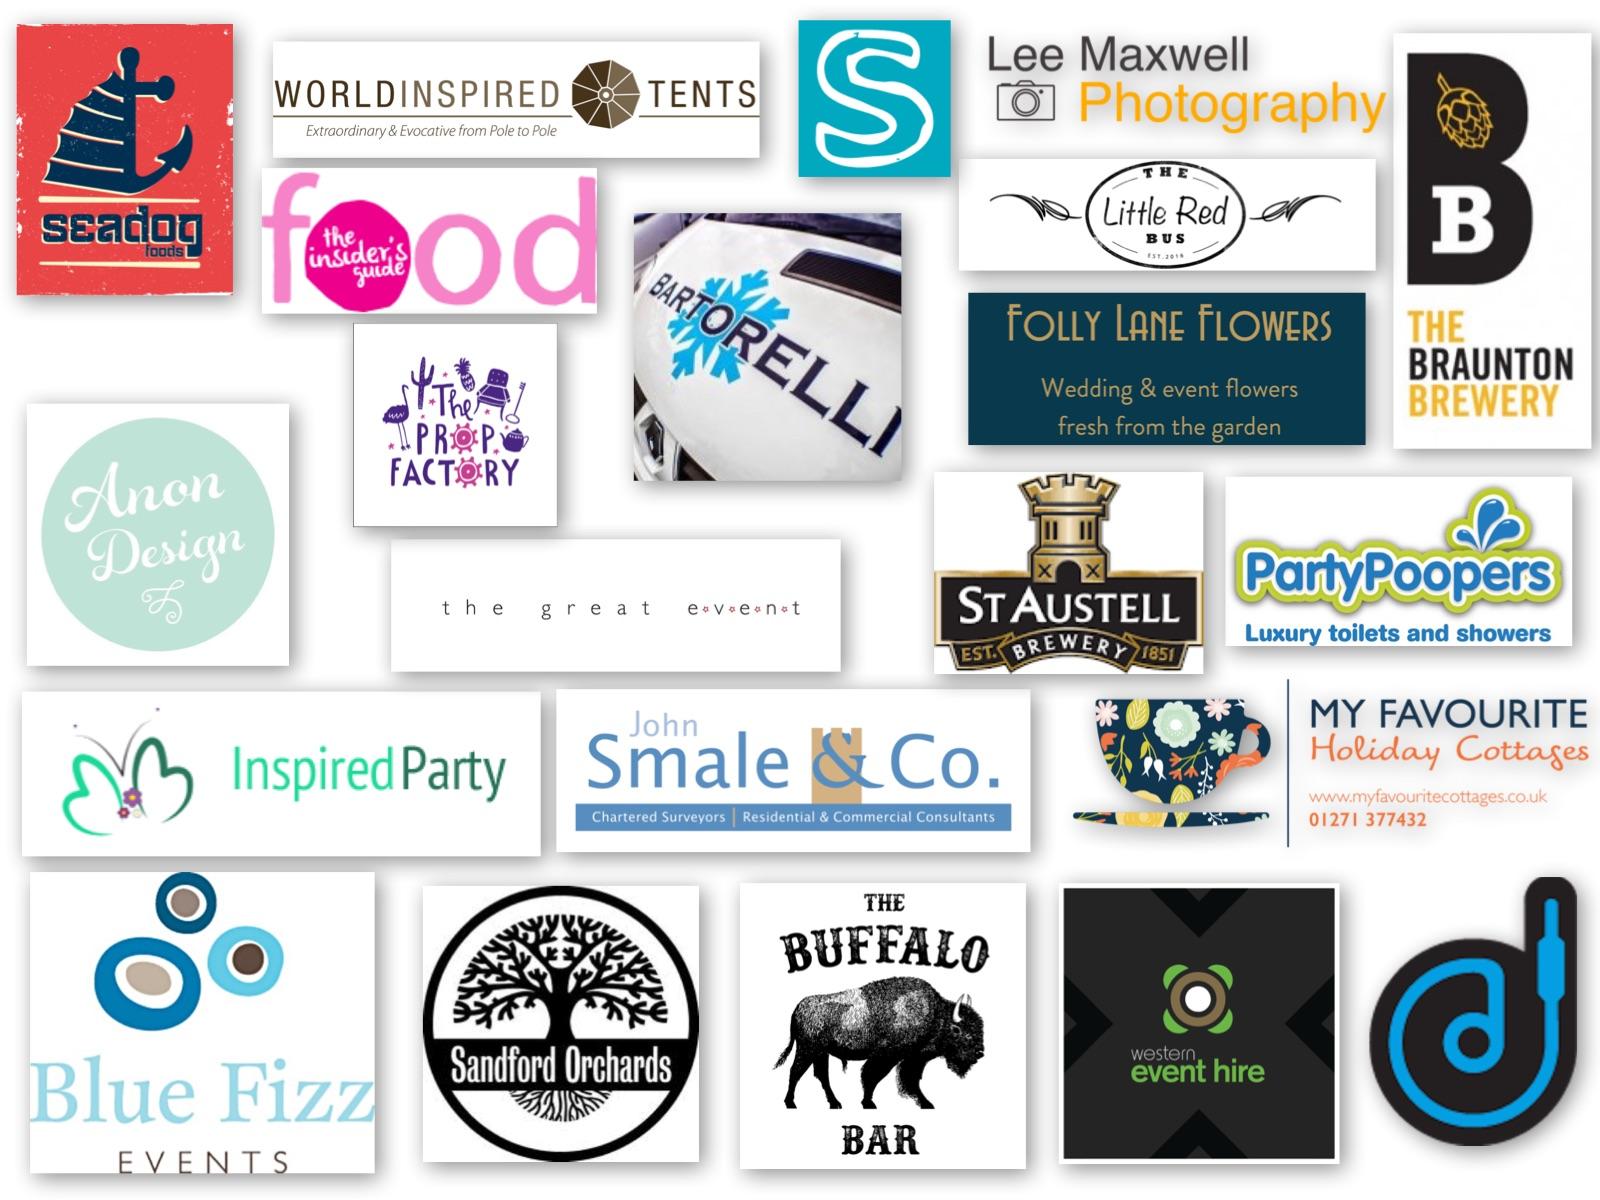 barefoot 2017 sponsors logos 5